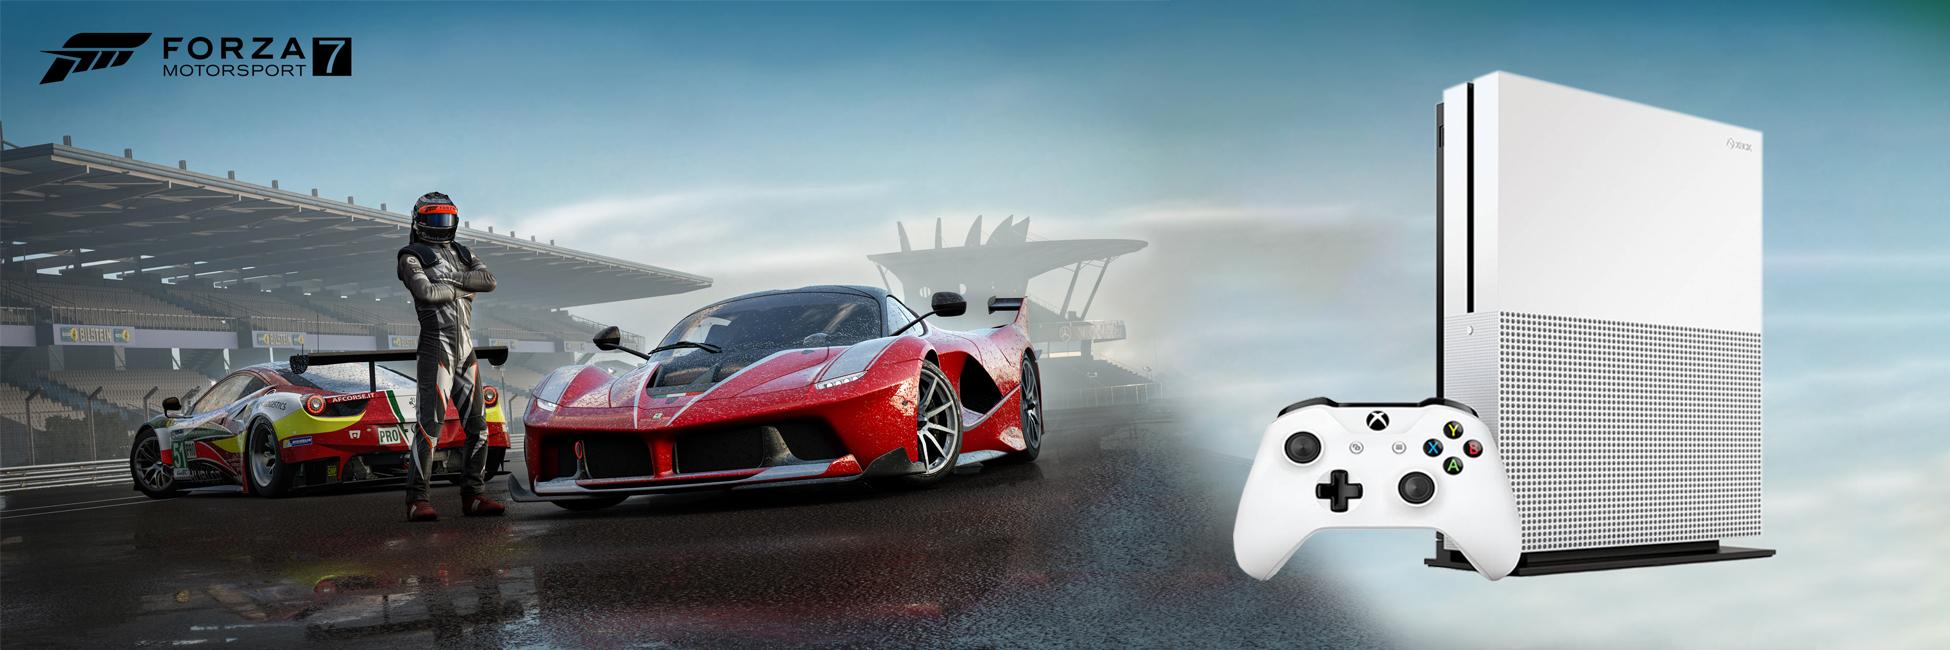 Xbox و بازی محبوب Forza7